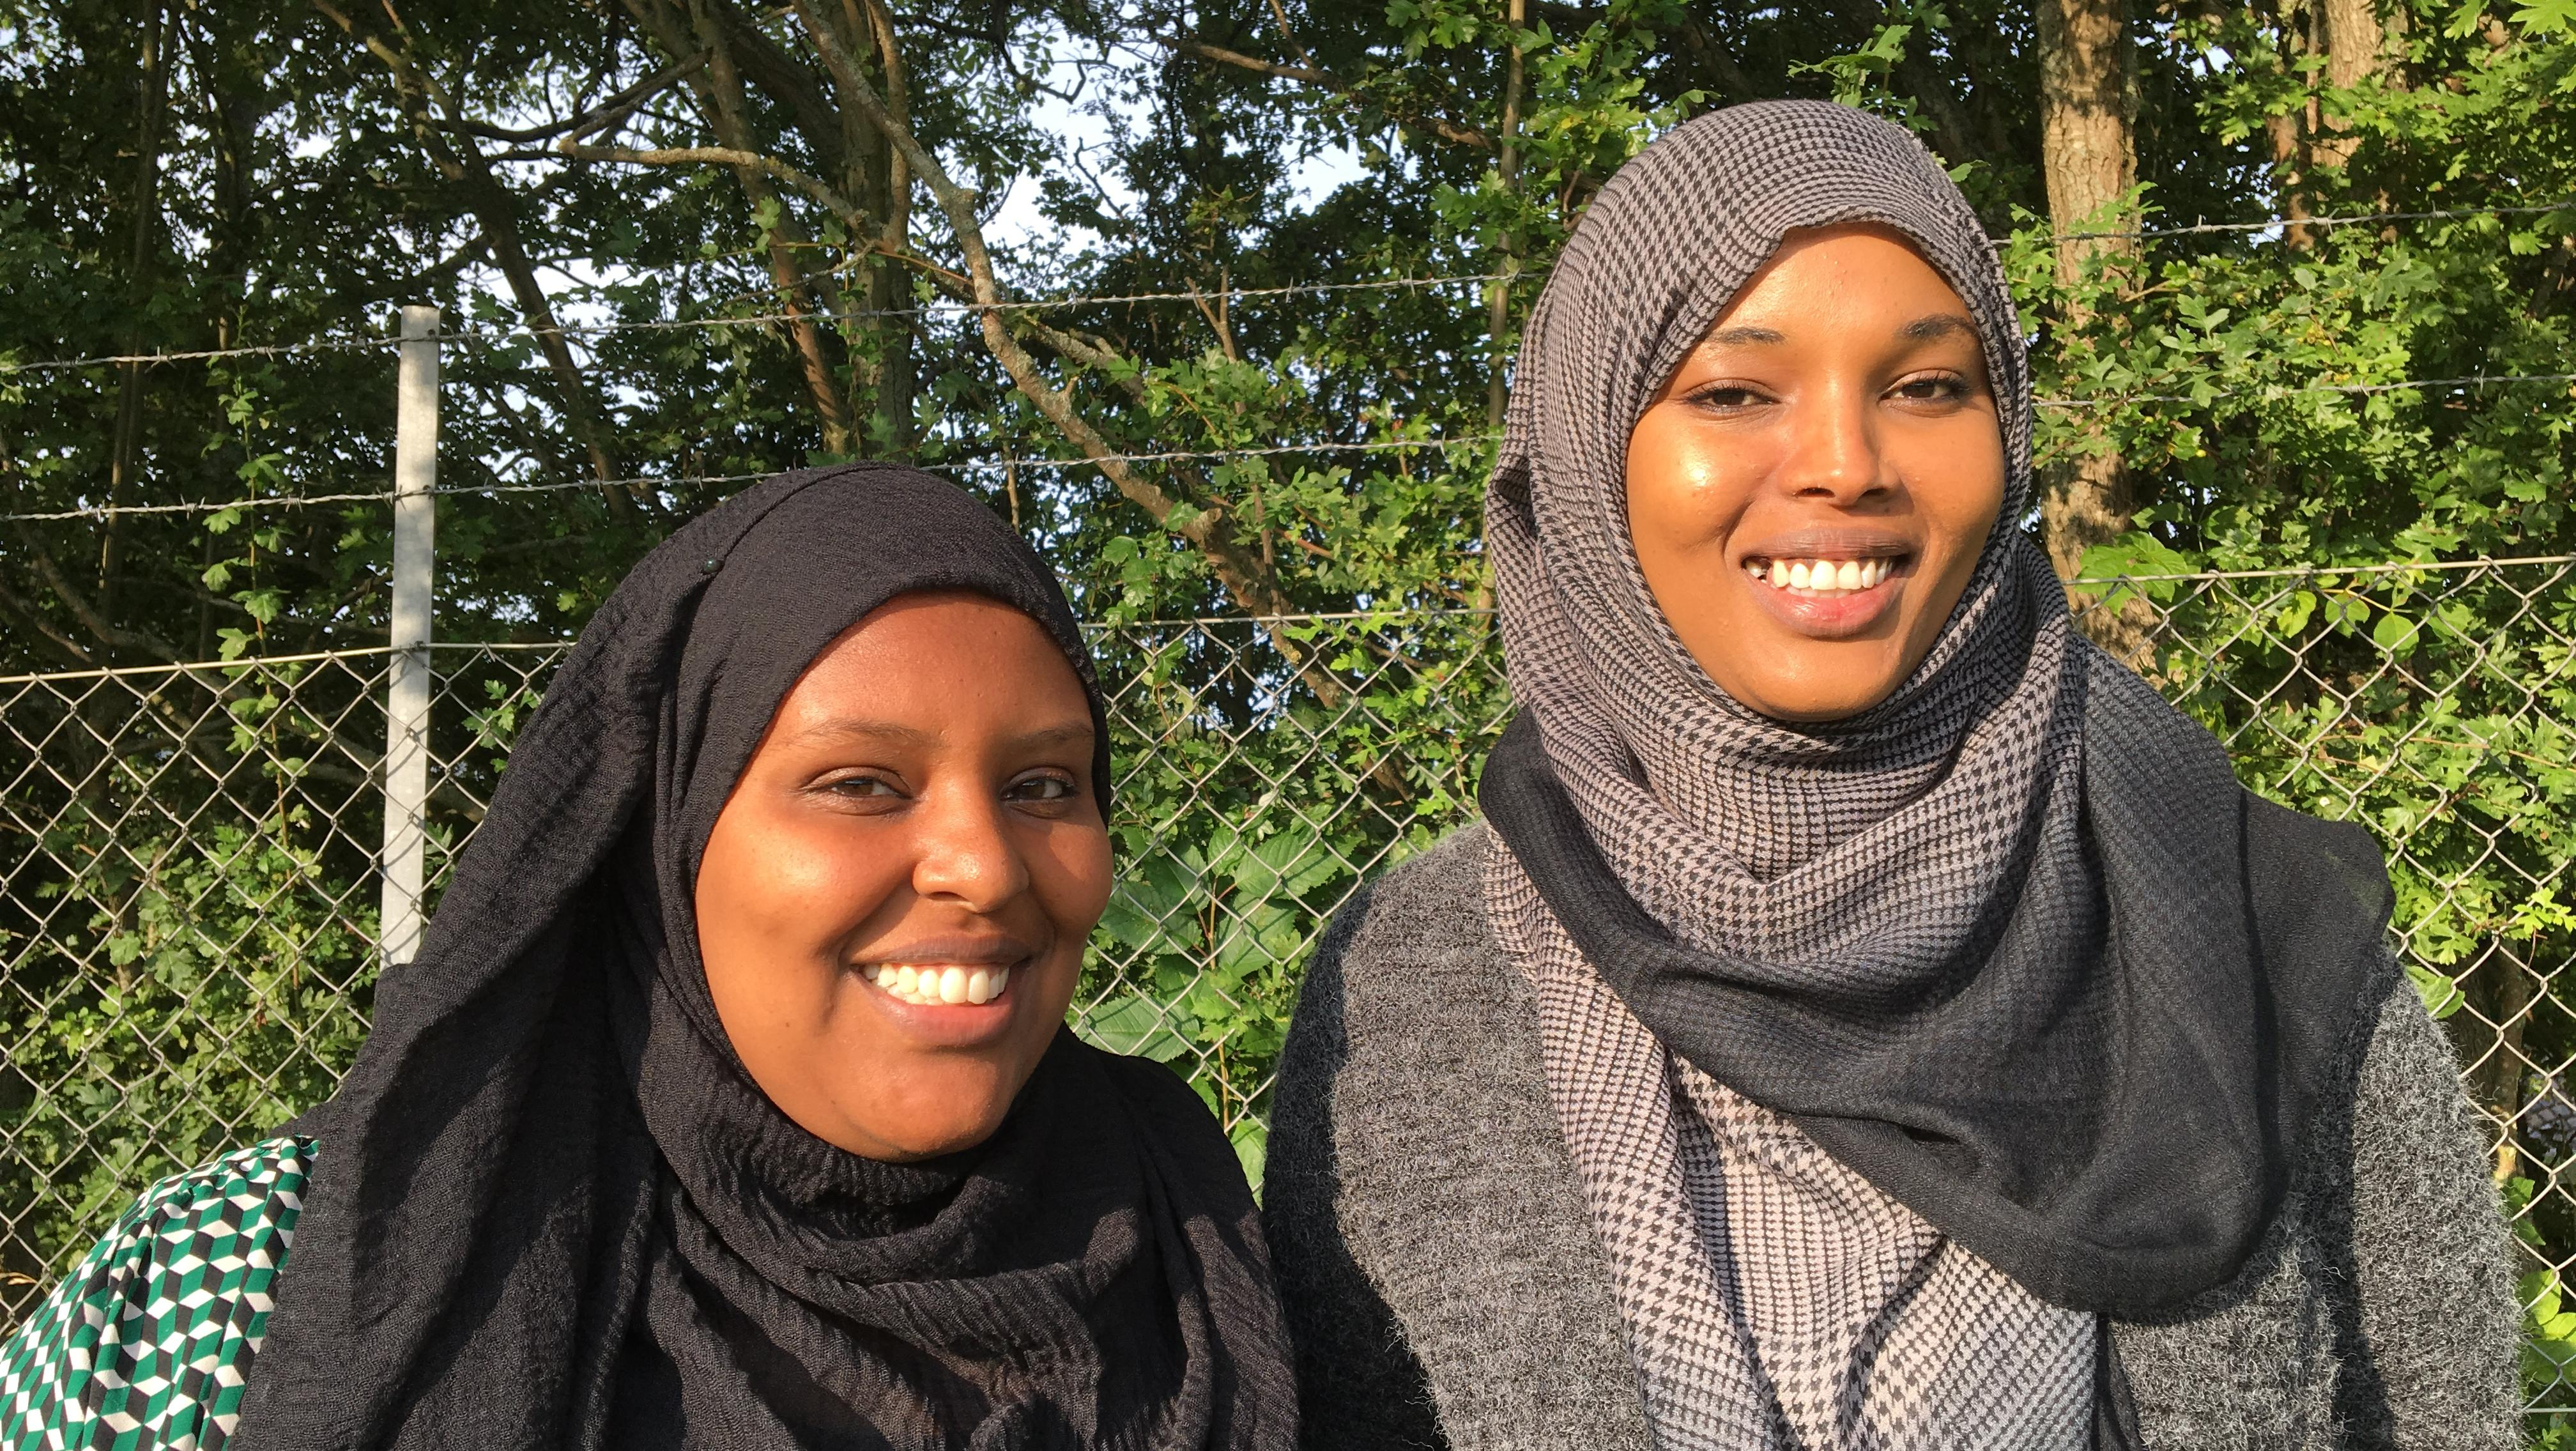 Fatima Yusuf Abdi og Ayan Abdullahi Hussein